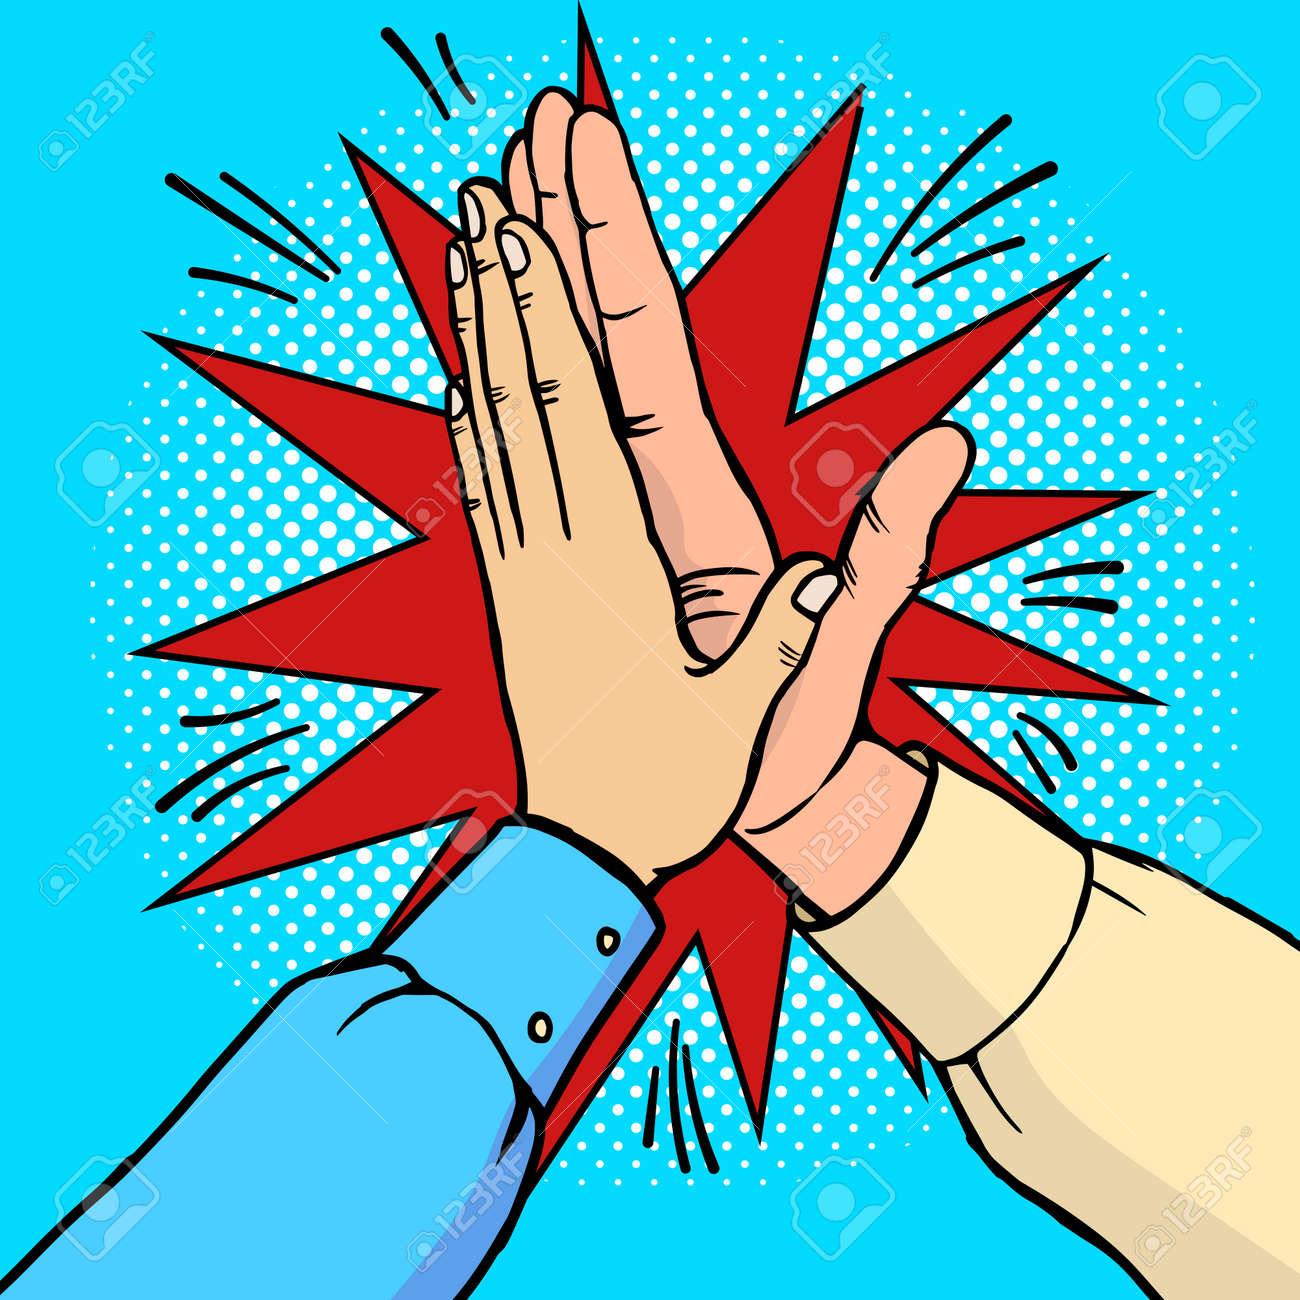 Hands high five pop art vector illustration - 76172751